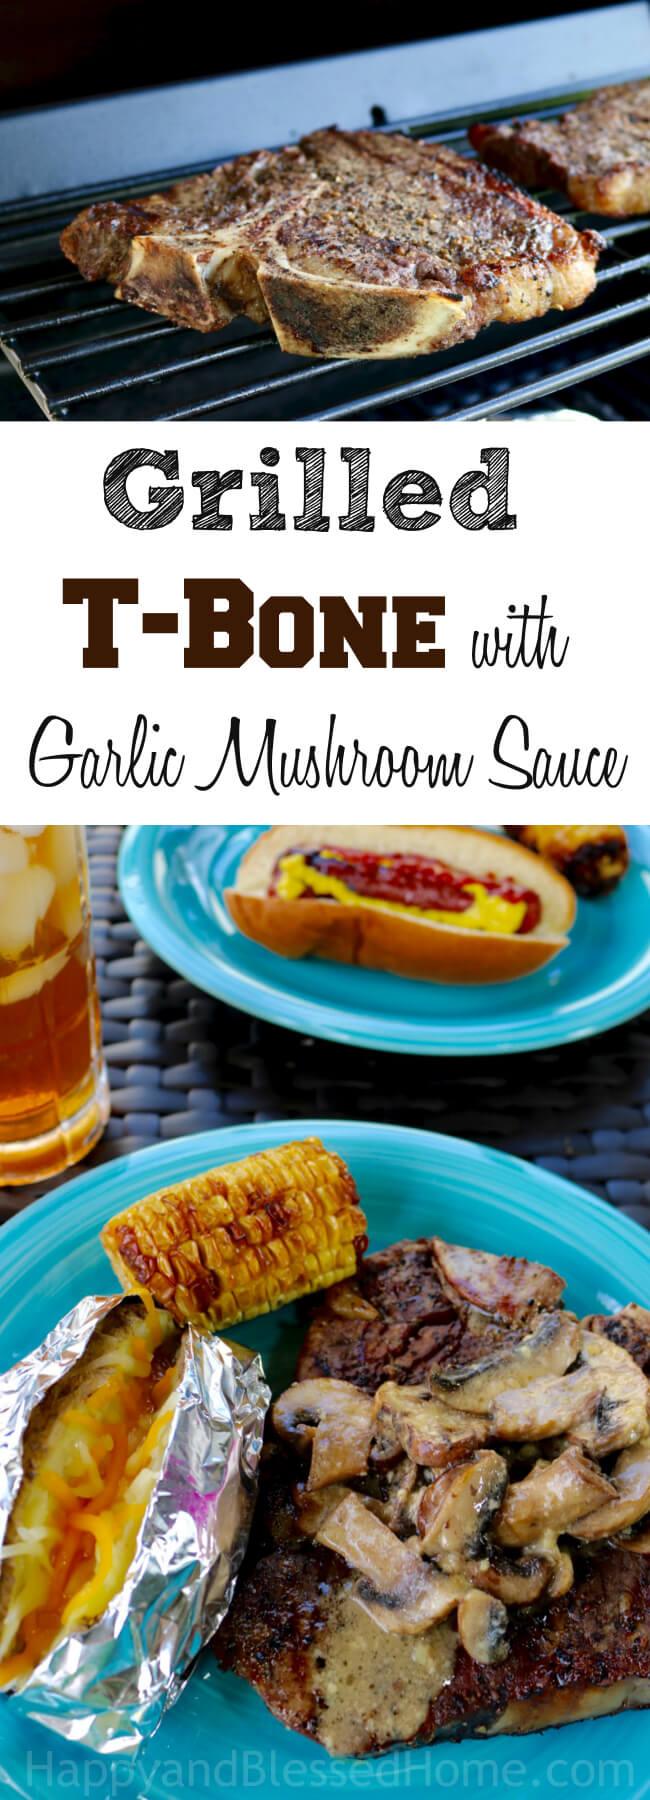 Juicy and Tender - Grilled T-Bone with Garlic Mushroom Sauce